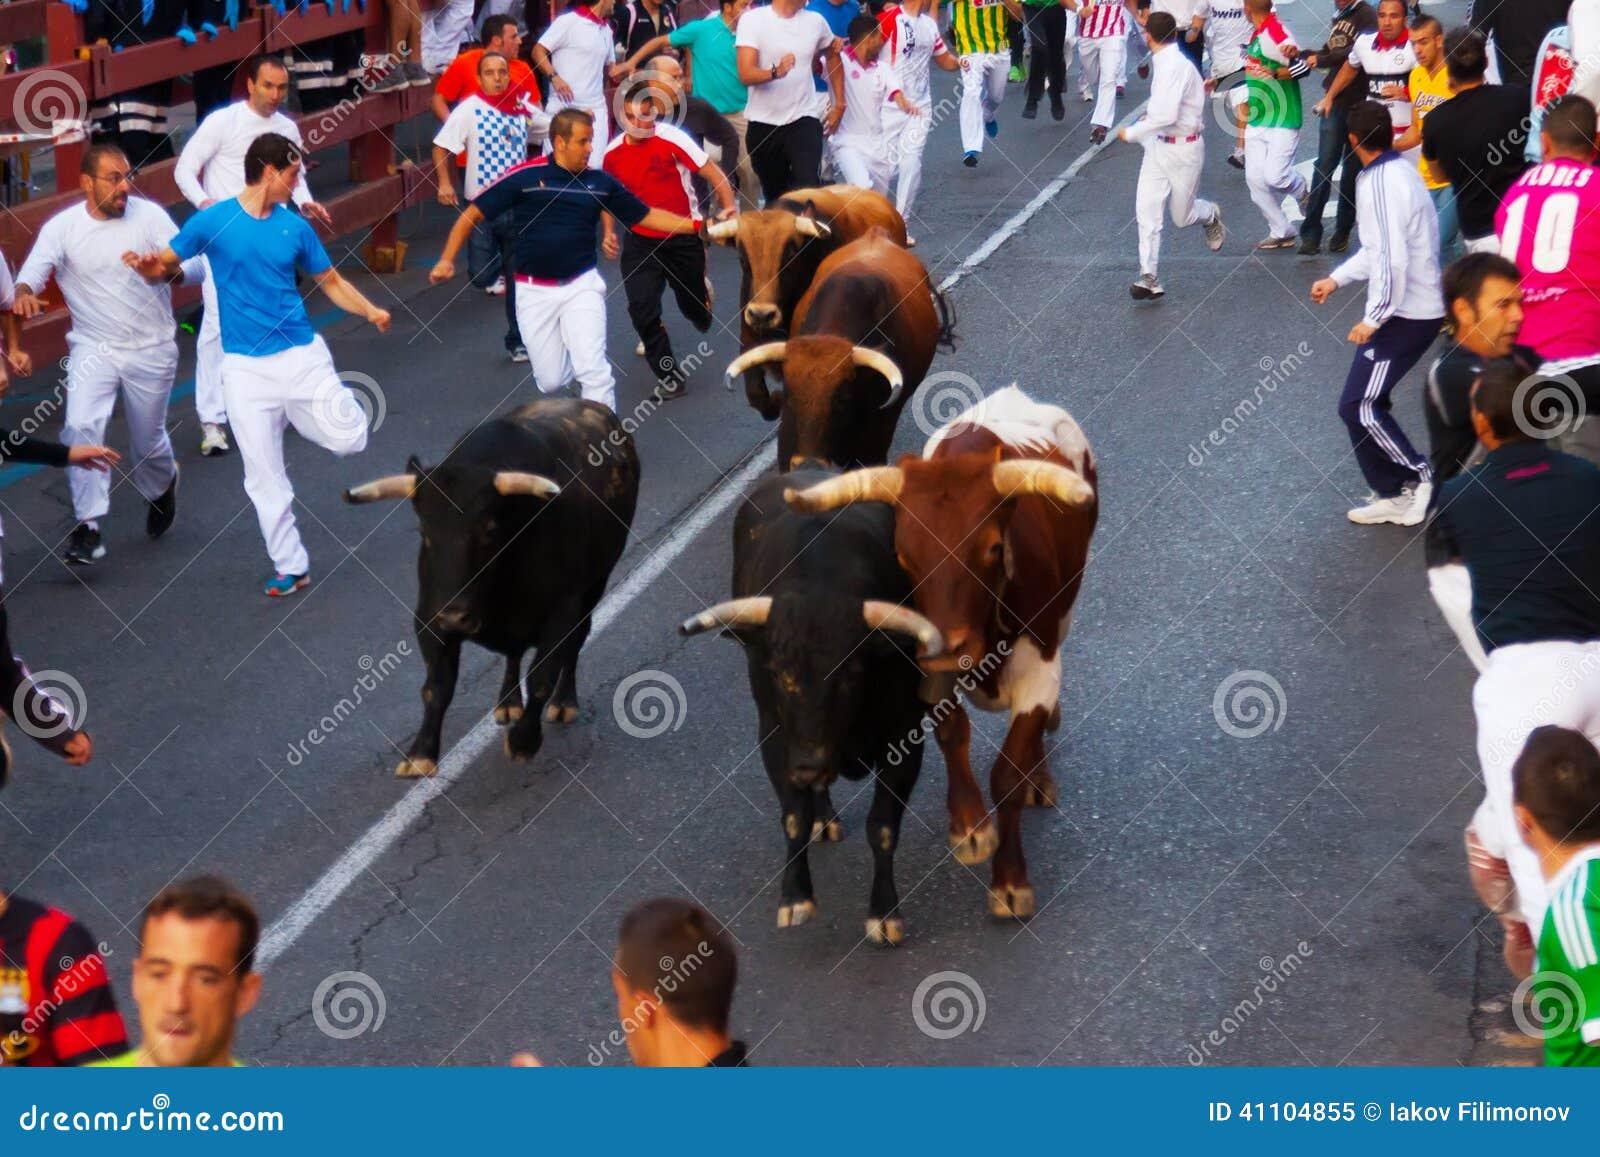 running of the bulls in san sebastian de los reyes editorial image image 41104855. Black Bedroom Furniture Sets. Home Design Ideas